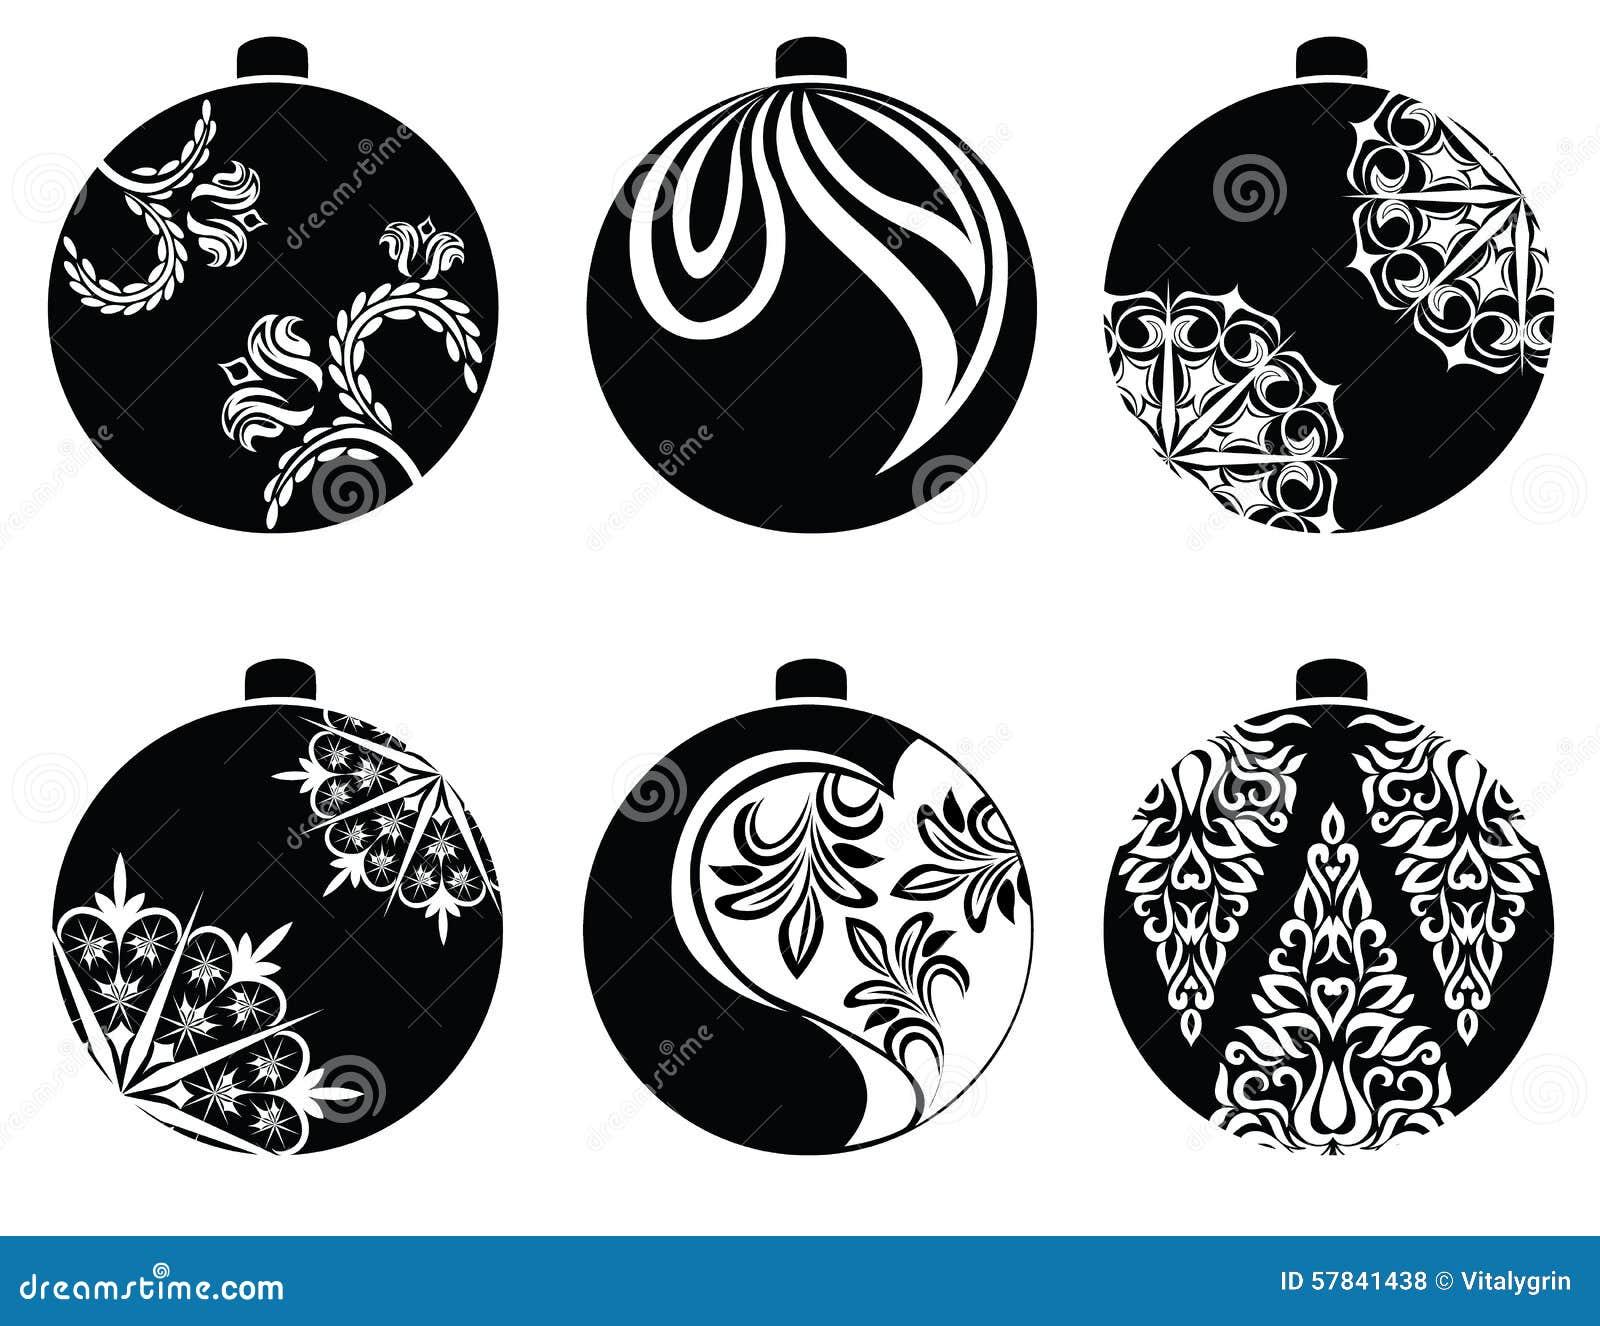 Christmas Balls Vector Stock Vector - Image: 57841438